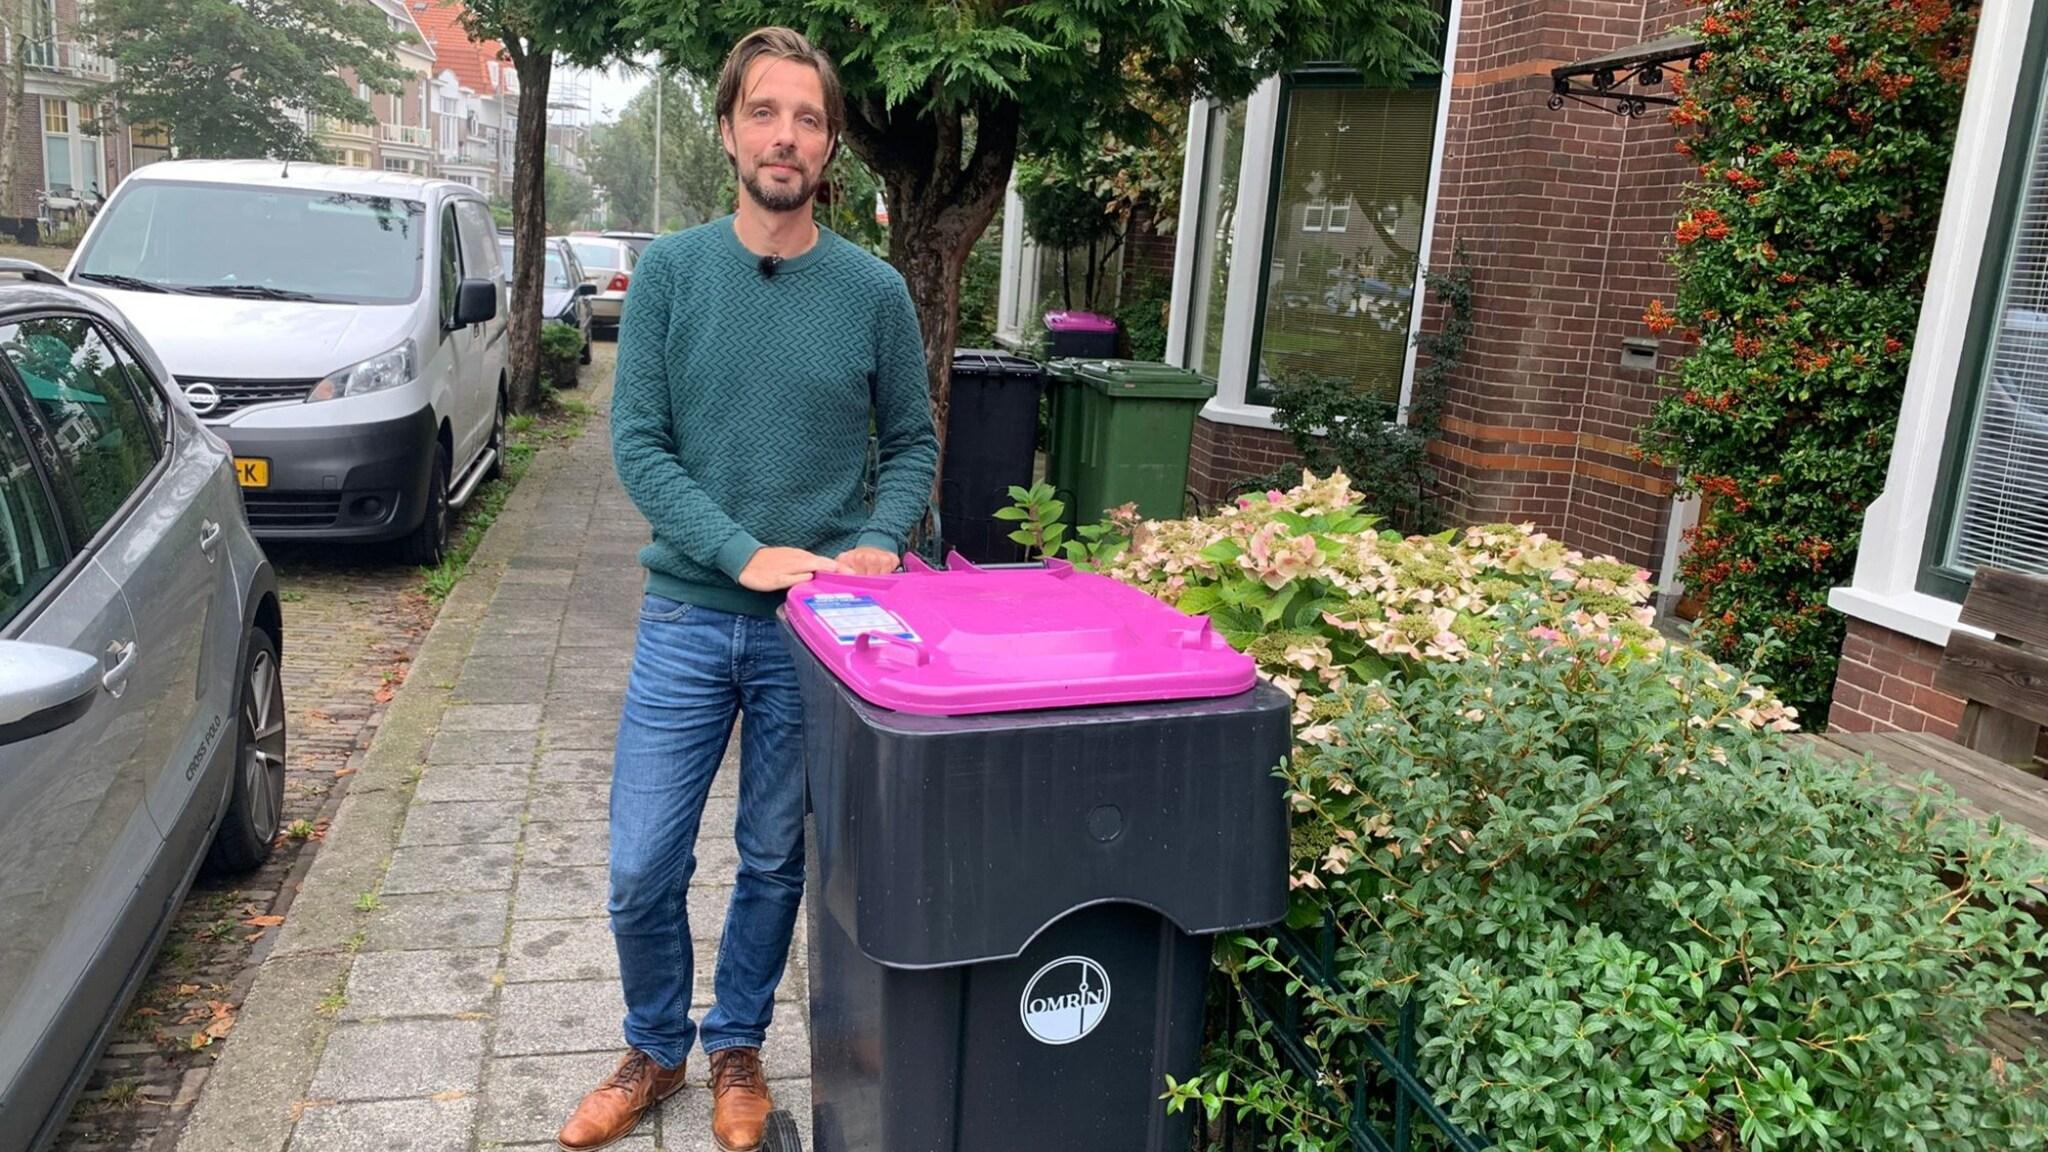 Bewoners Leeuwarden boos om fuchsia afvalbakken: 'Het triggert'